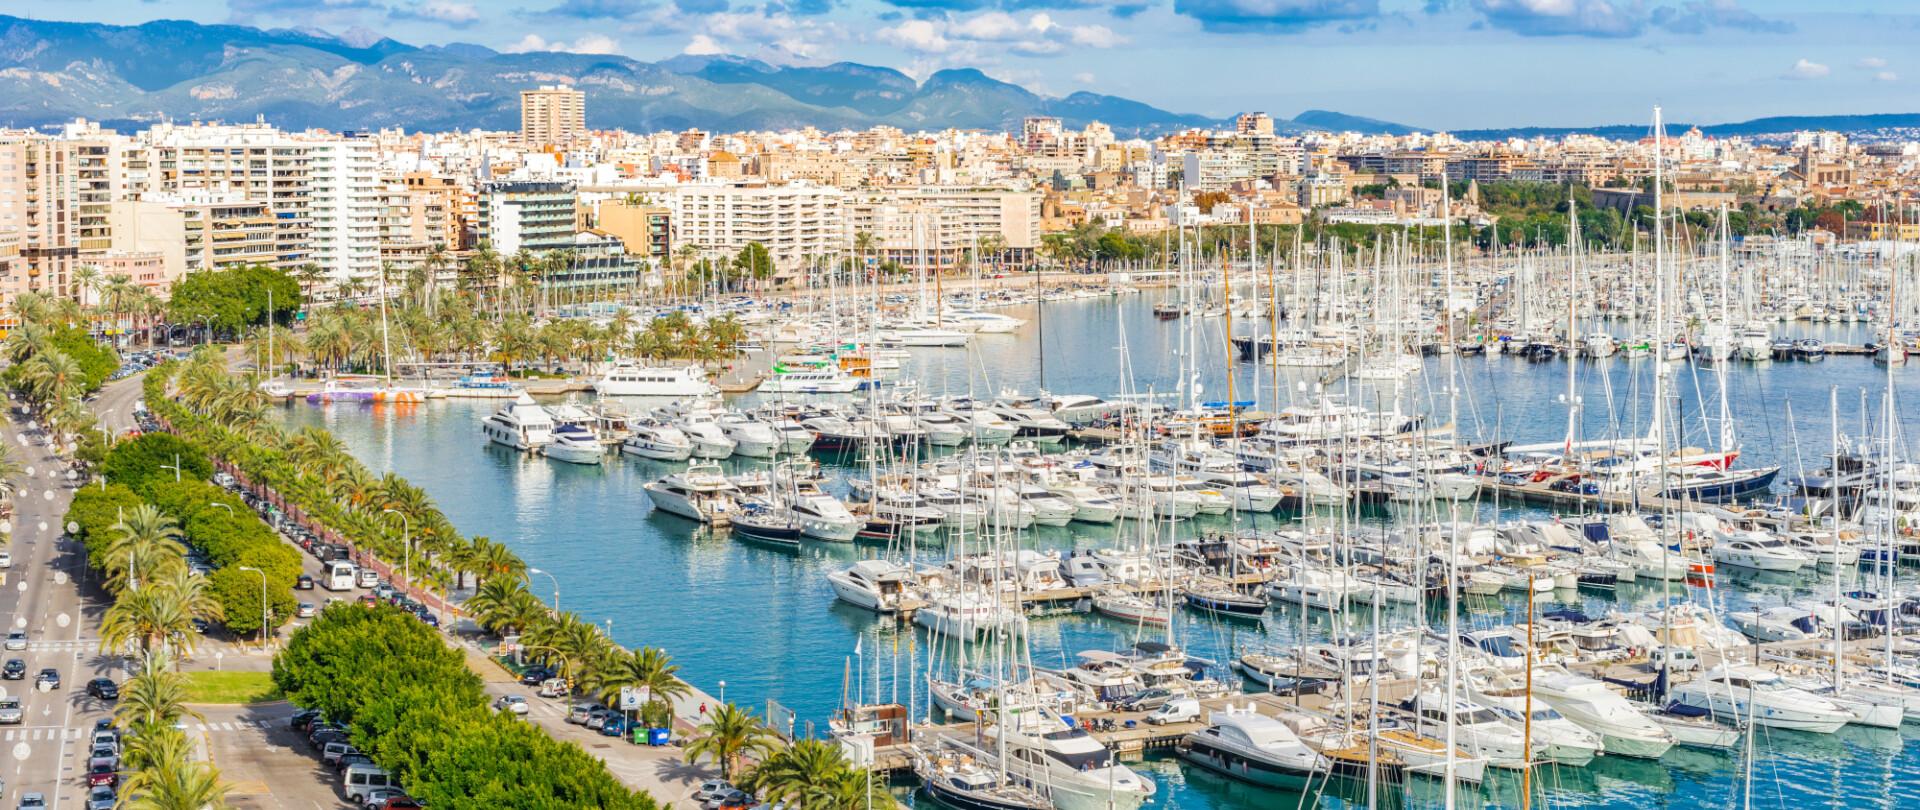 The Palma Superyacht Show 2019